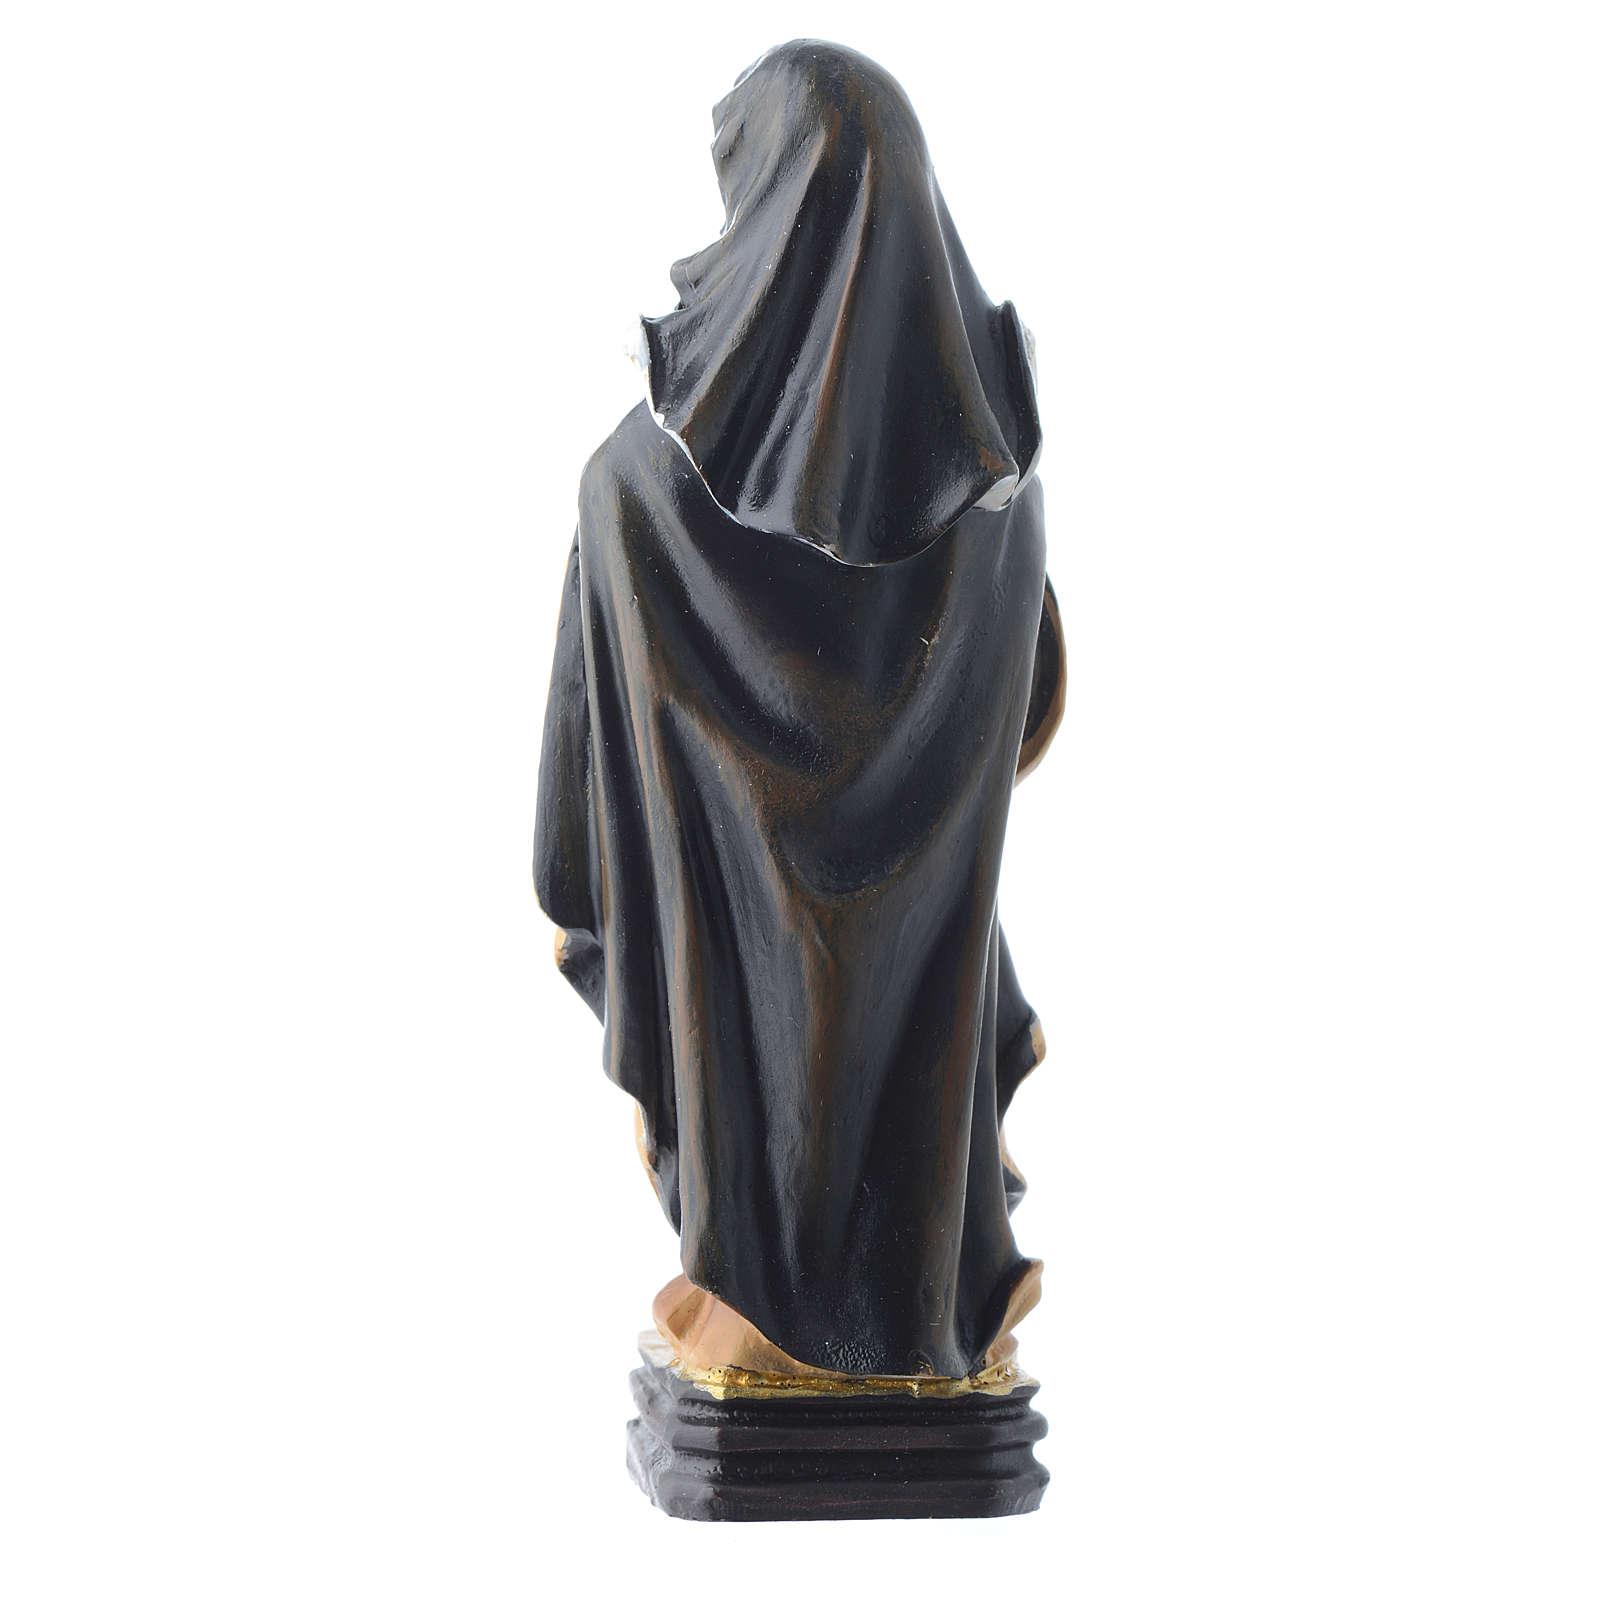 Heilige Klara 12cm PVC Packung MEHRSPRACHIGES GEBET 4